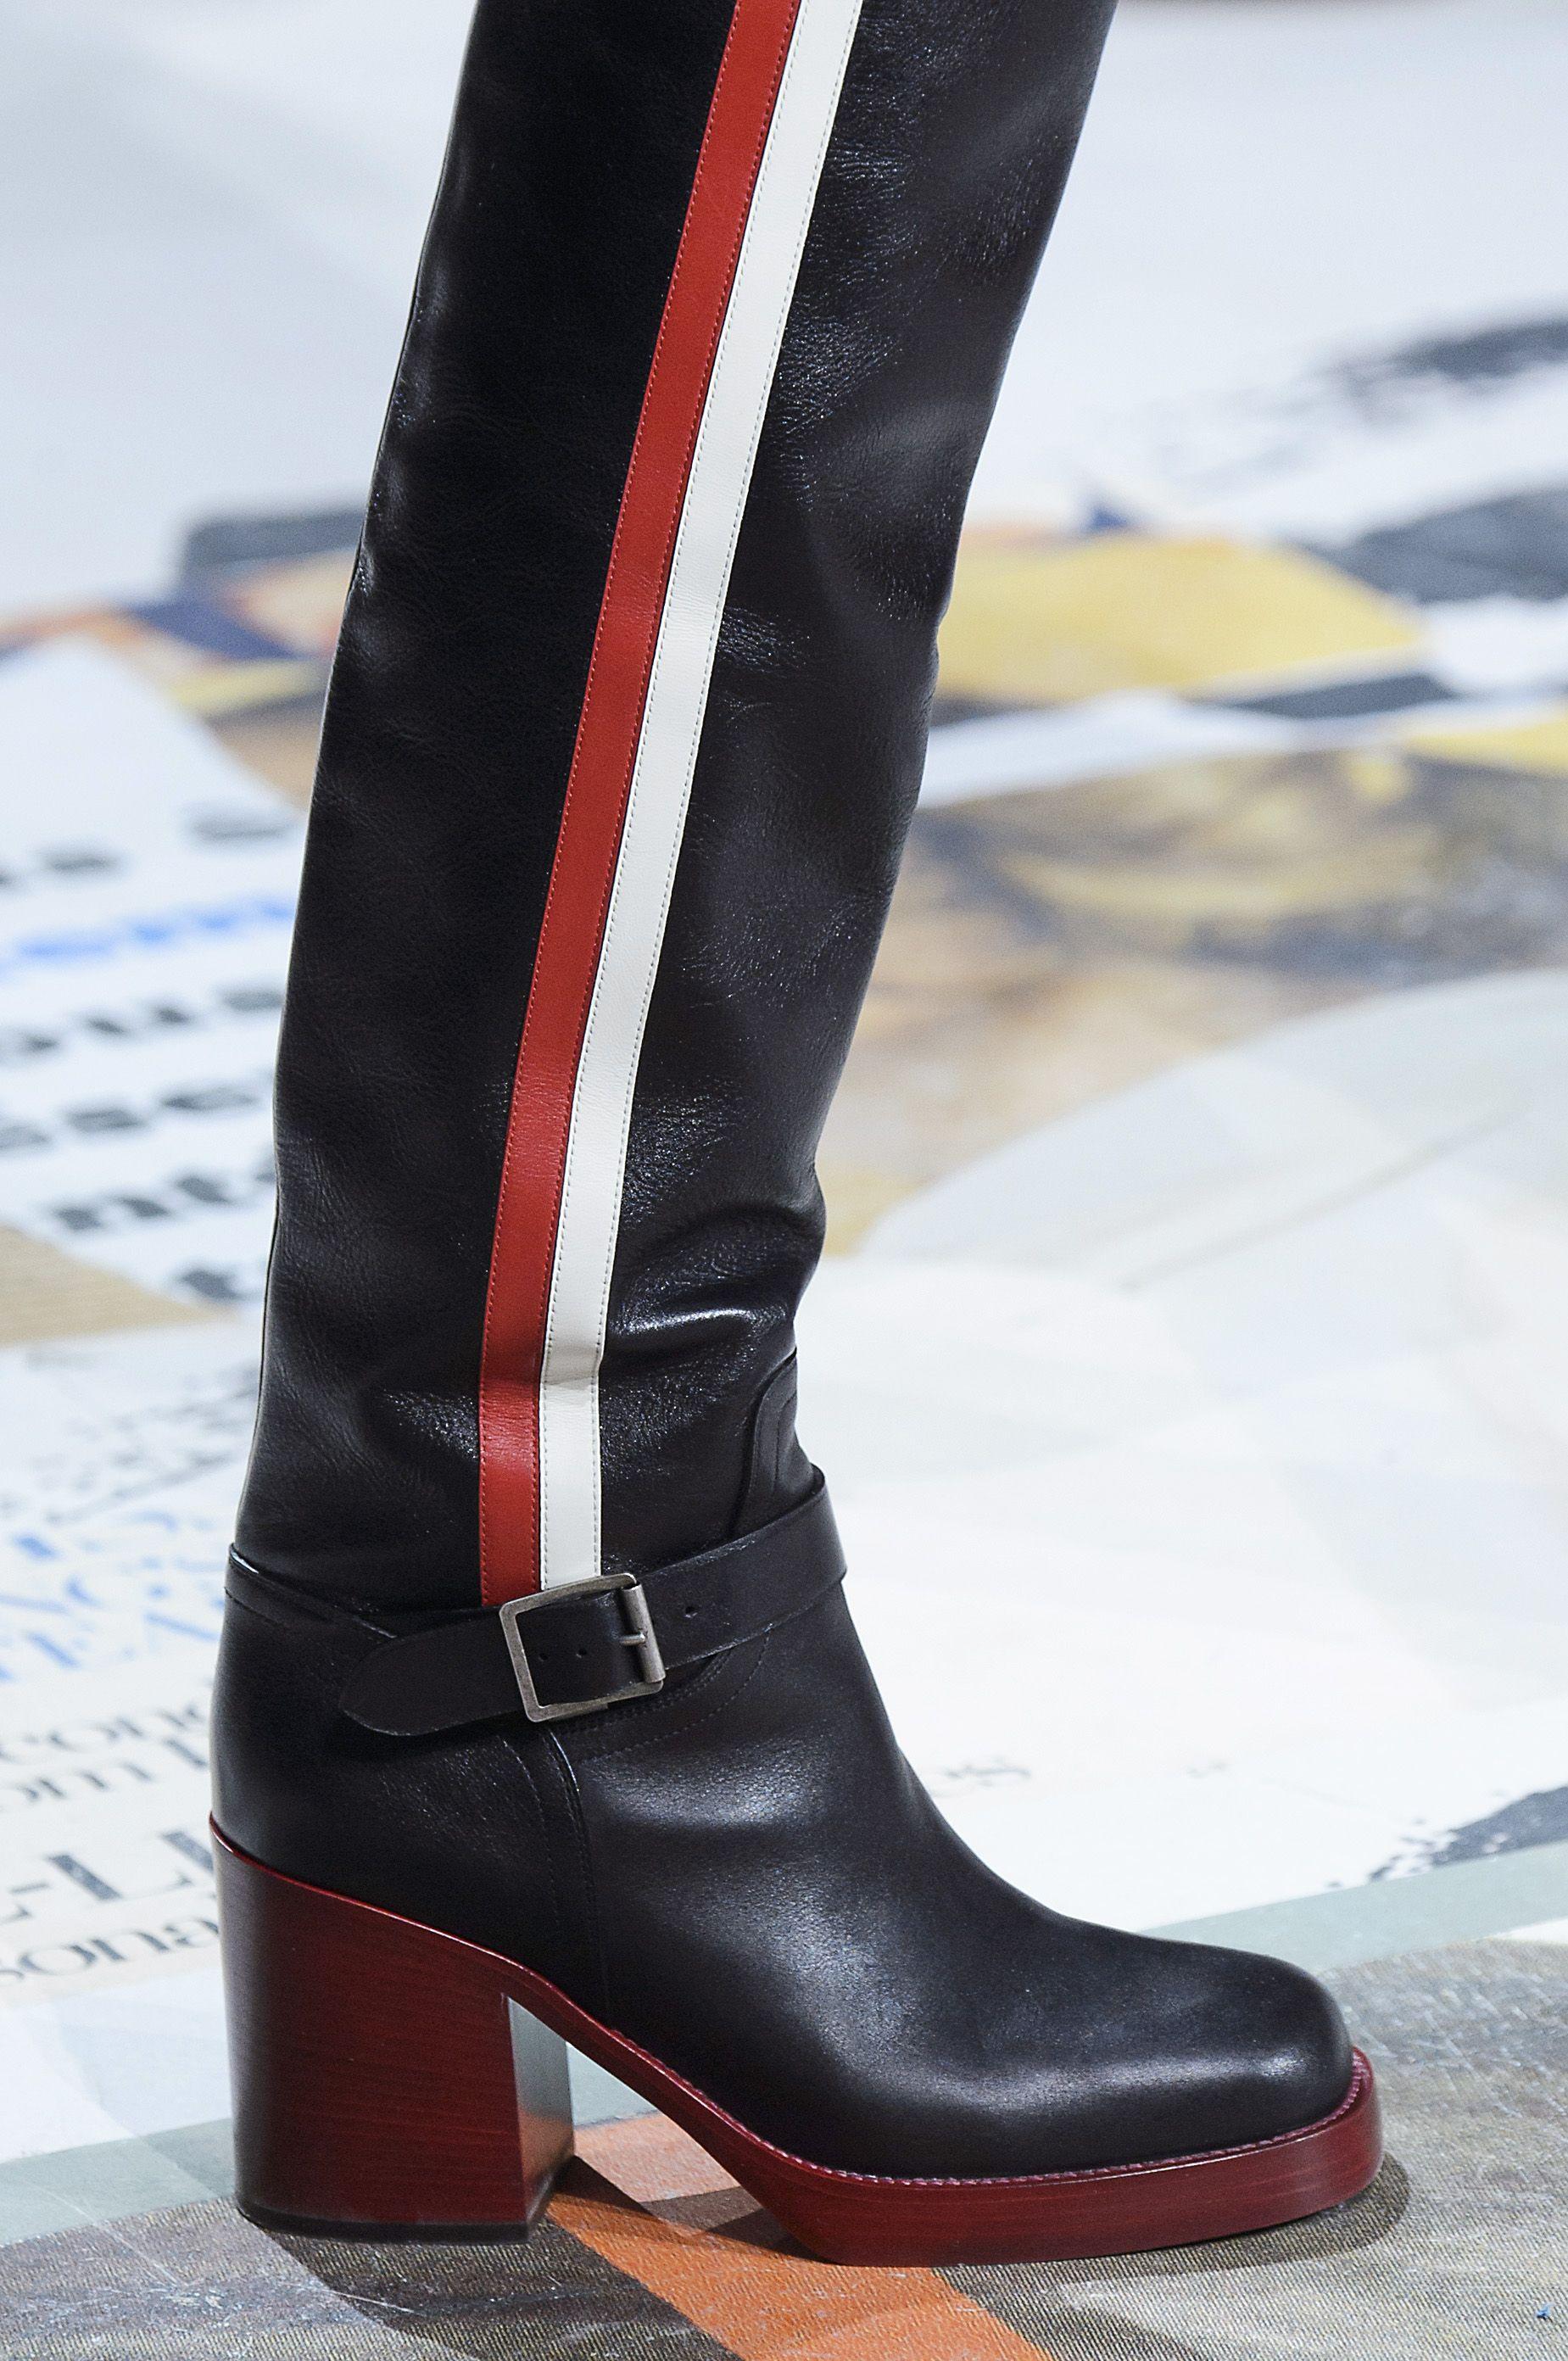 Trendy Boots Fall-Winter 2019 foto